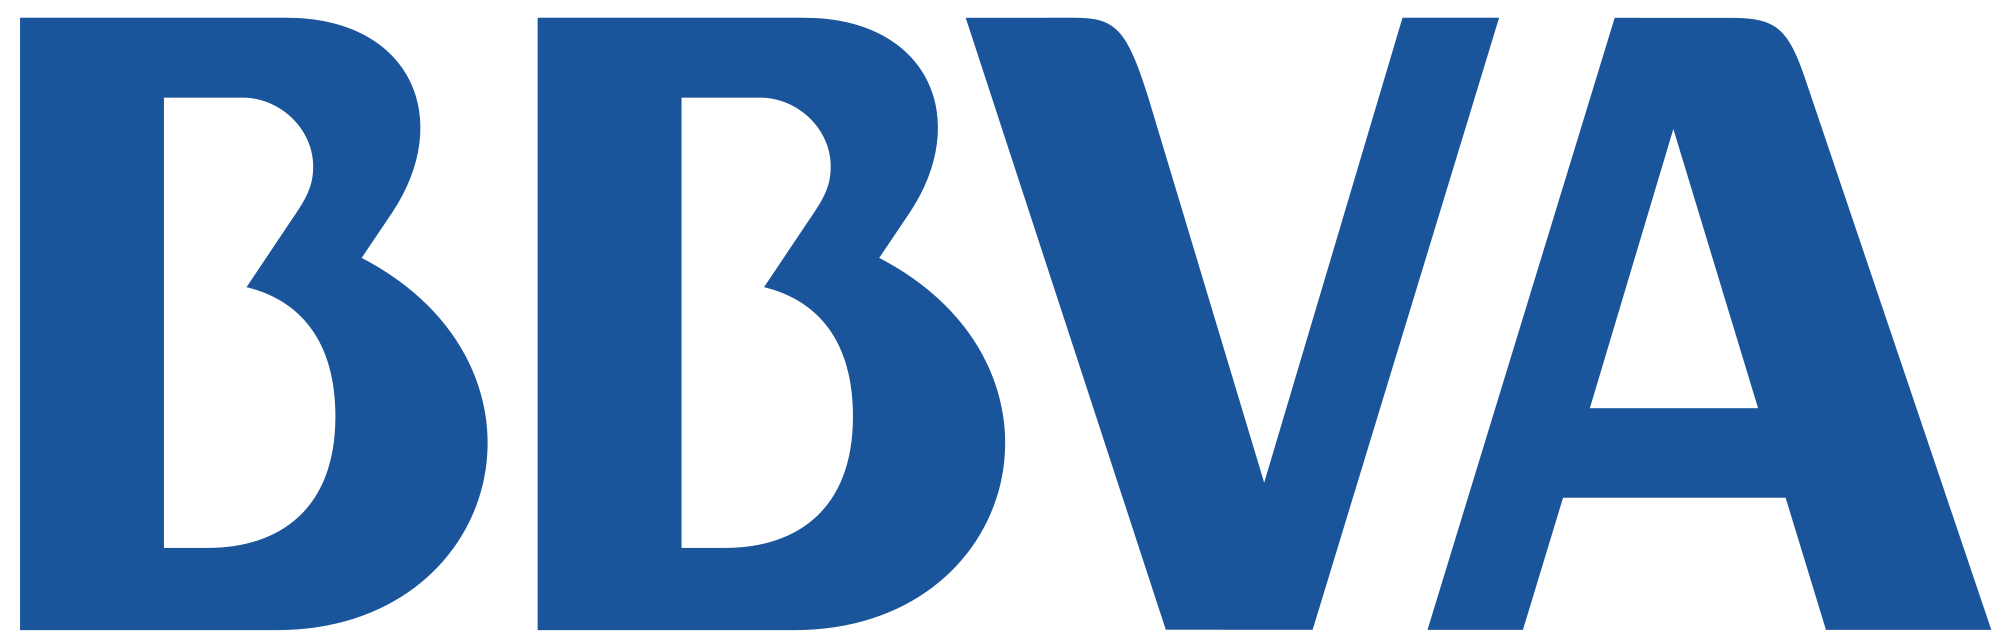 BBVA の成功事例